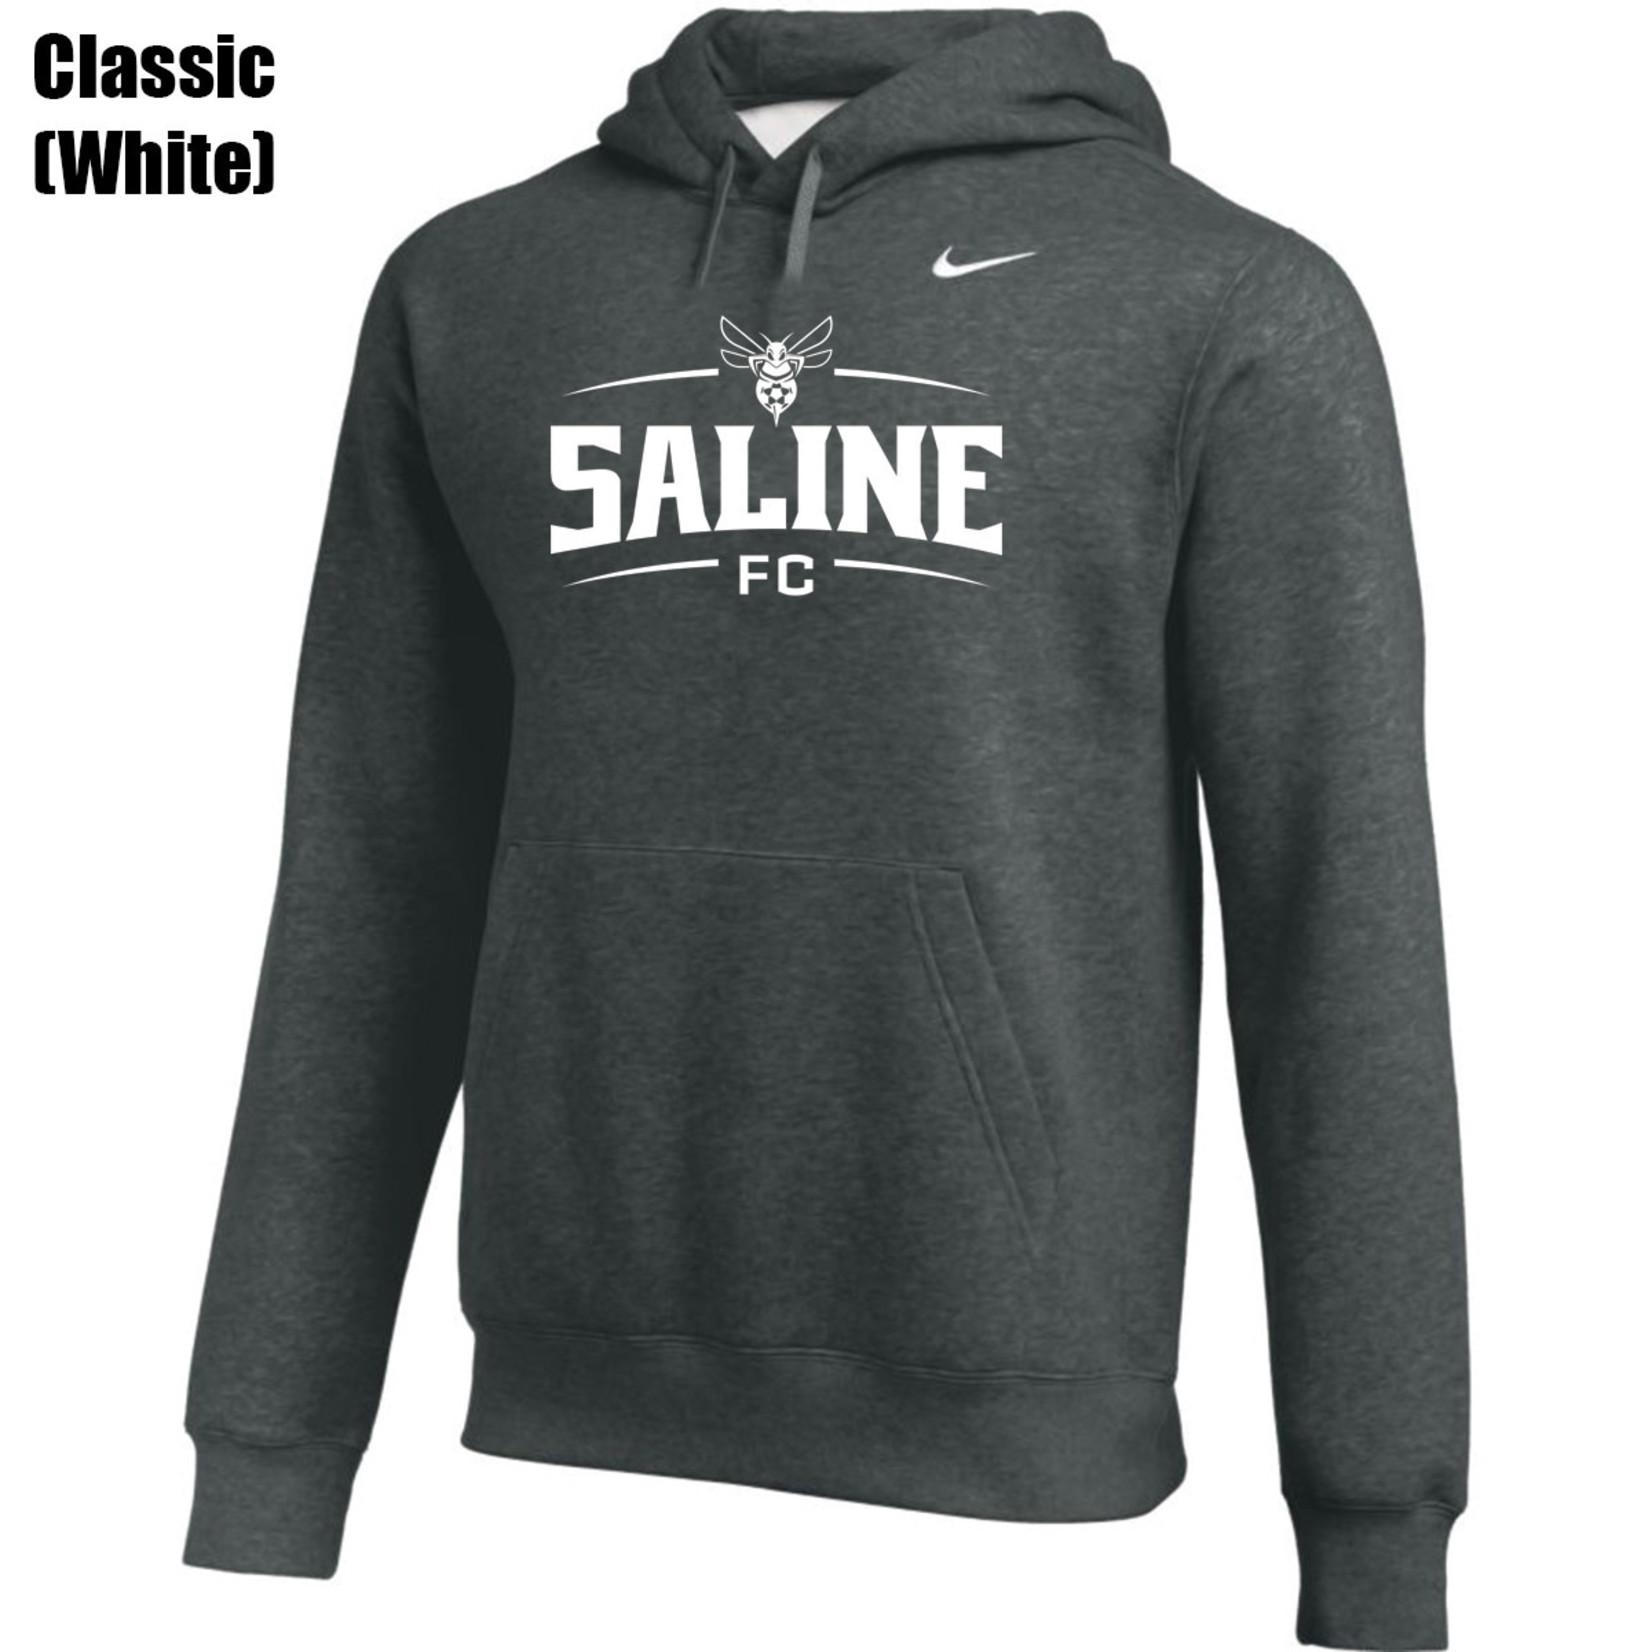 NIKE SALINE CLUB HOODY YOUTH (DARK GRAY)